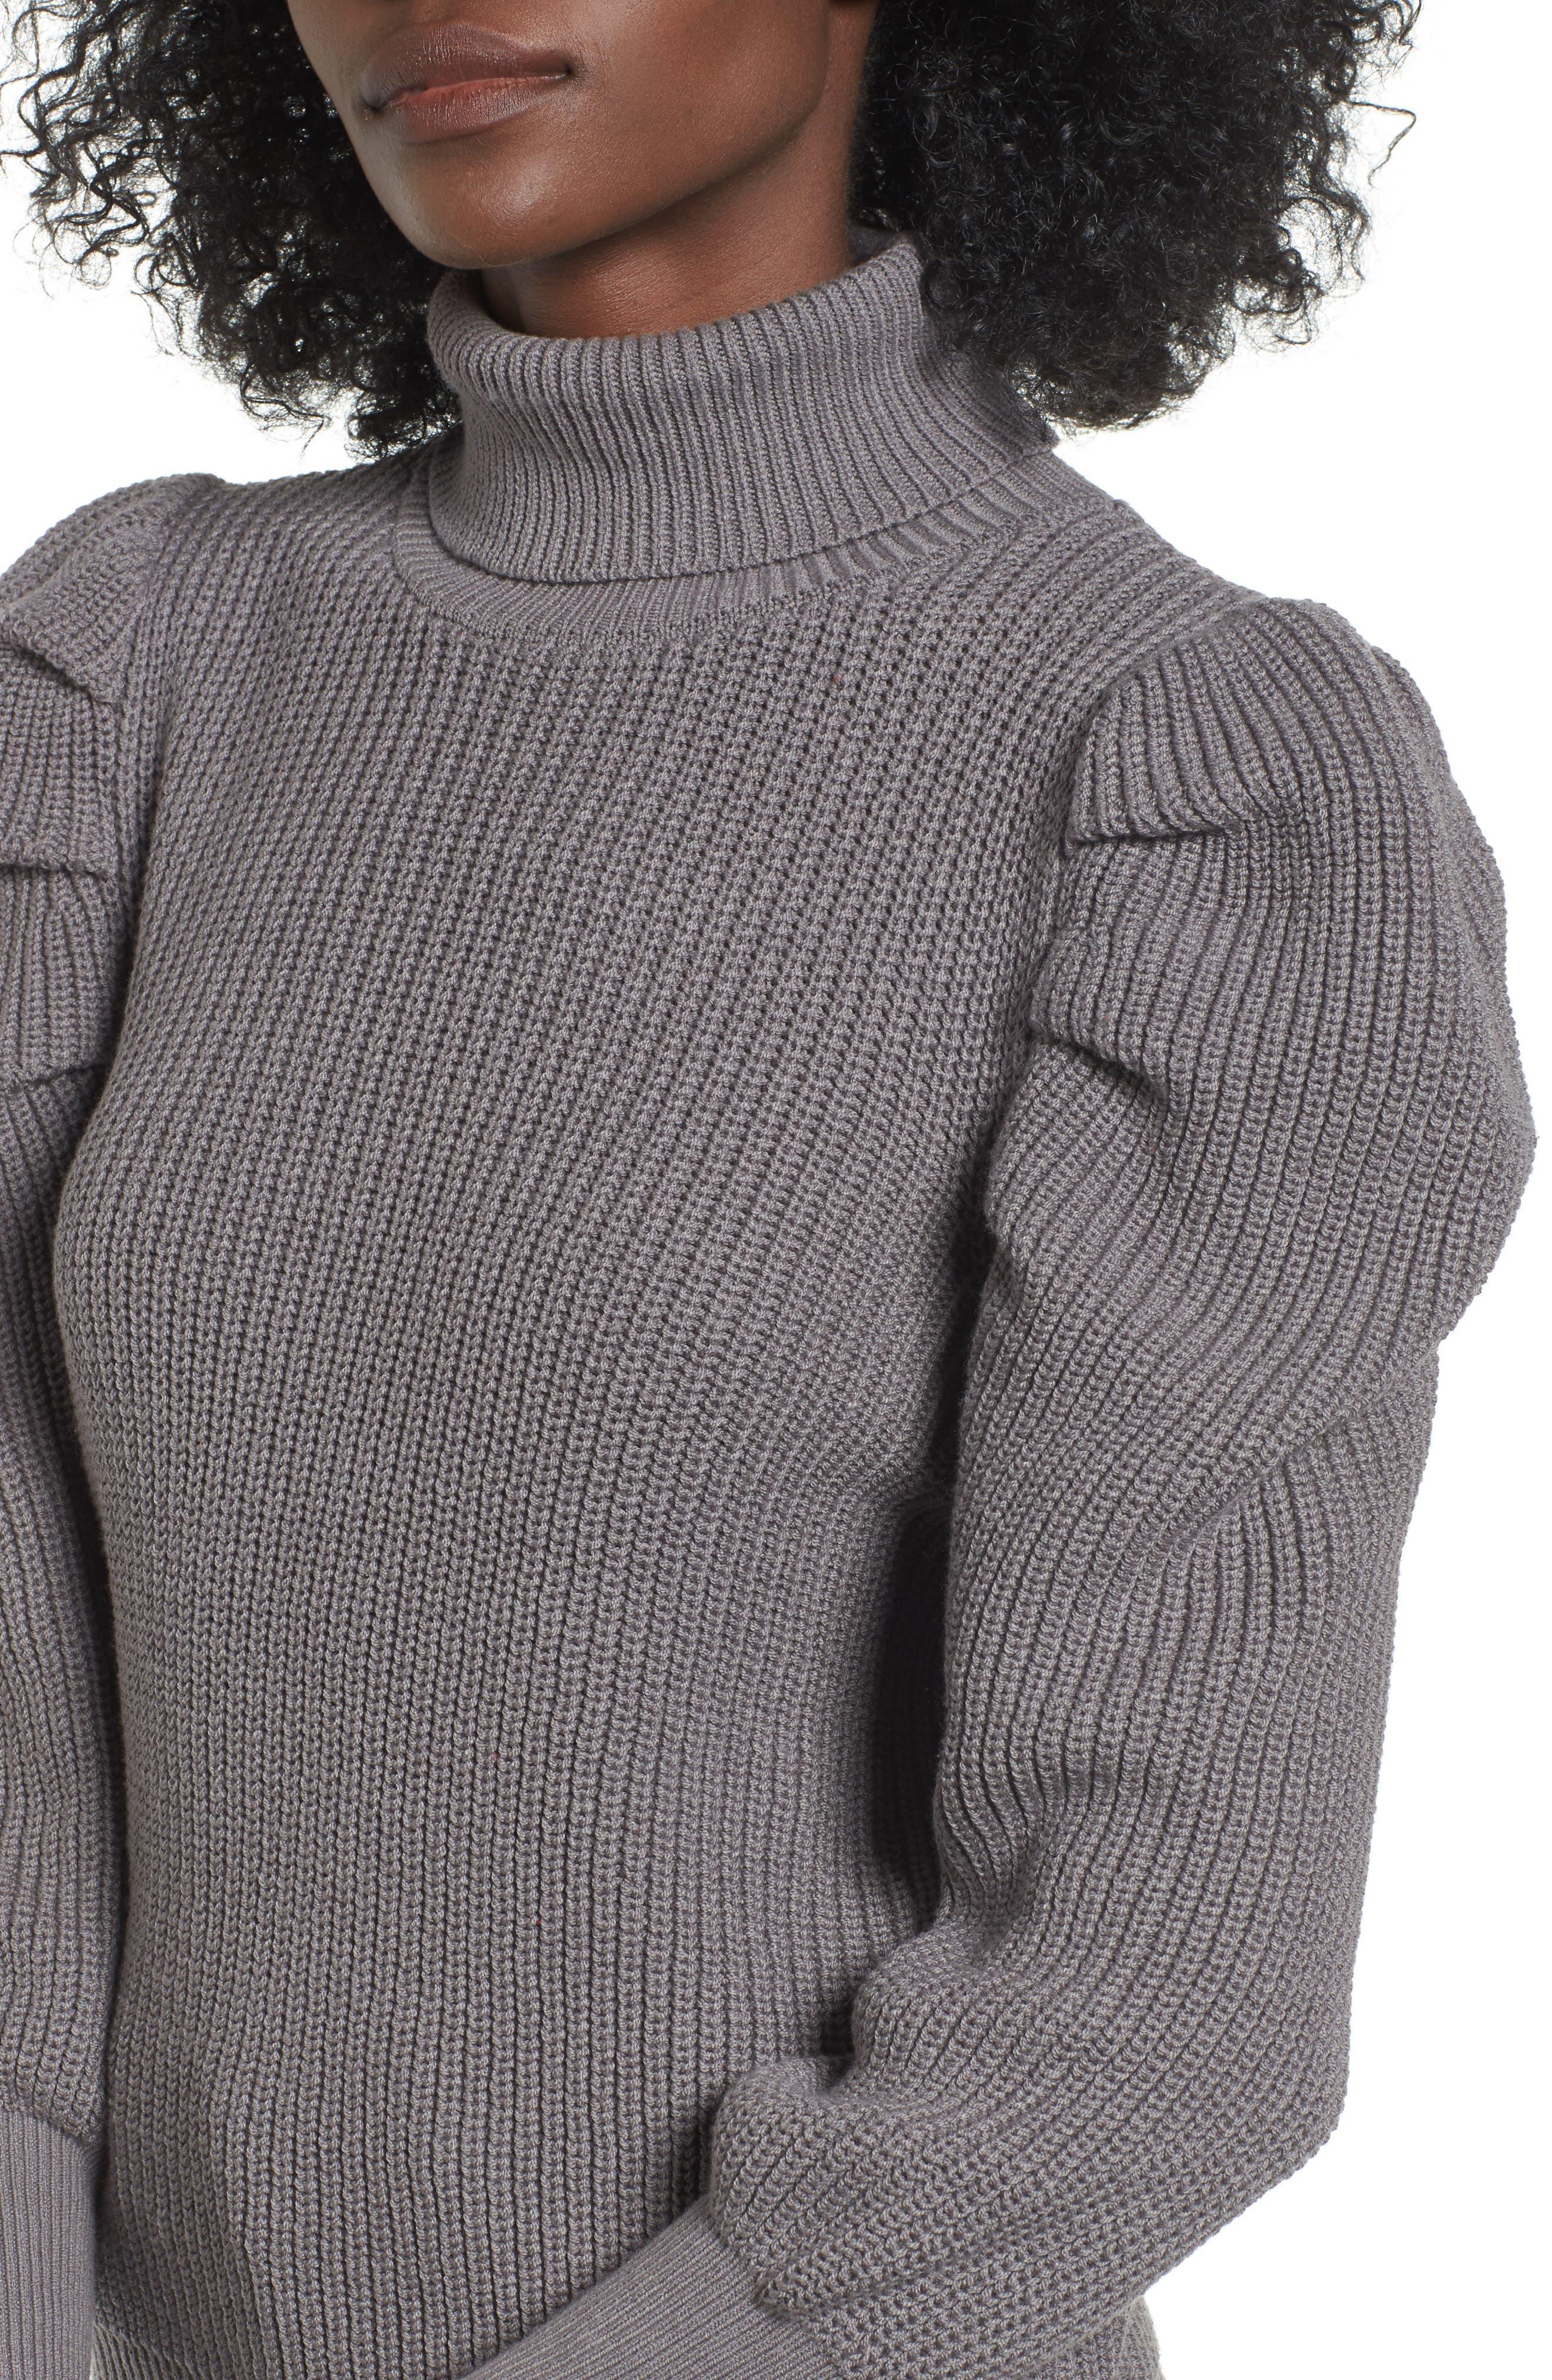 Puff Sleeve Turtleneck Sweater,                             Alternate thumbnail 4, color,                             030